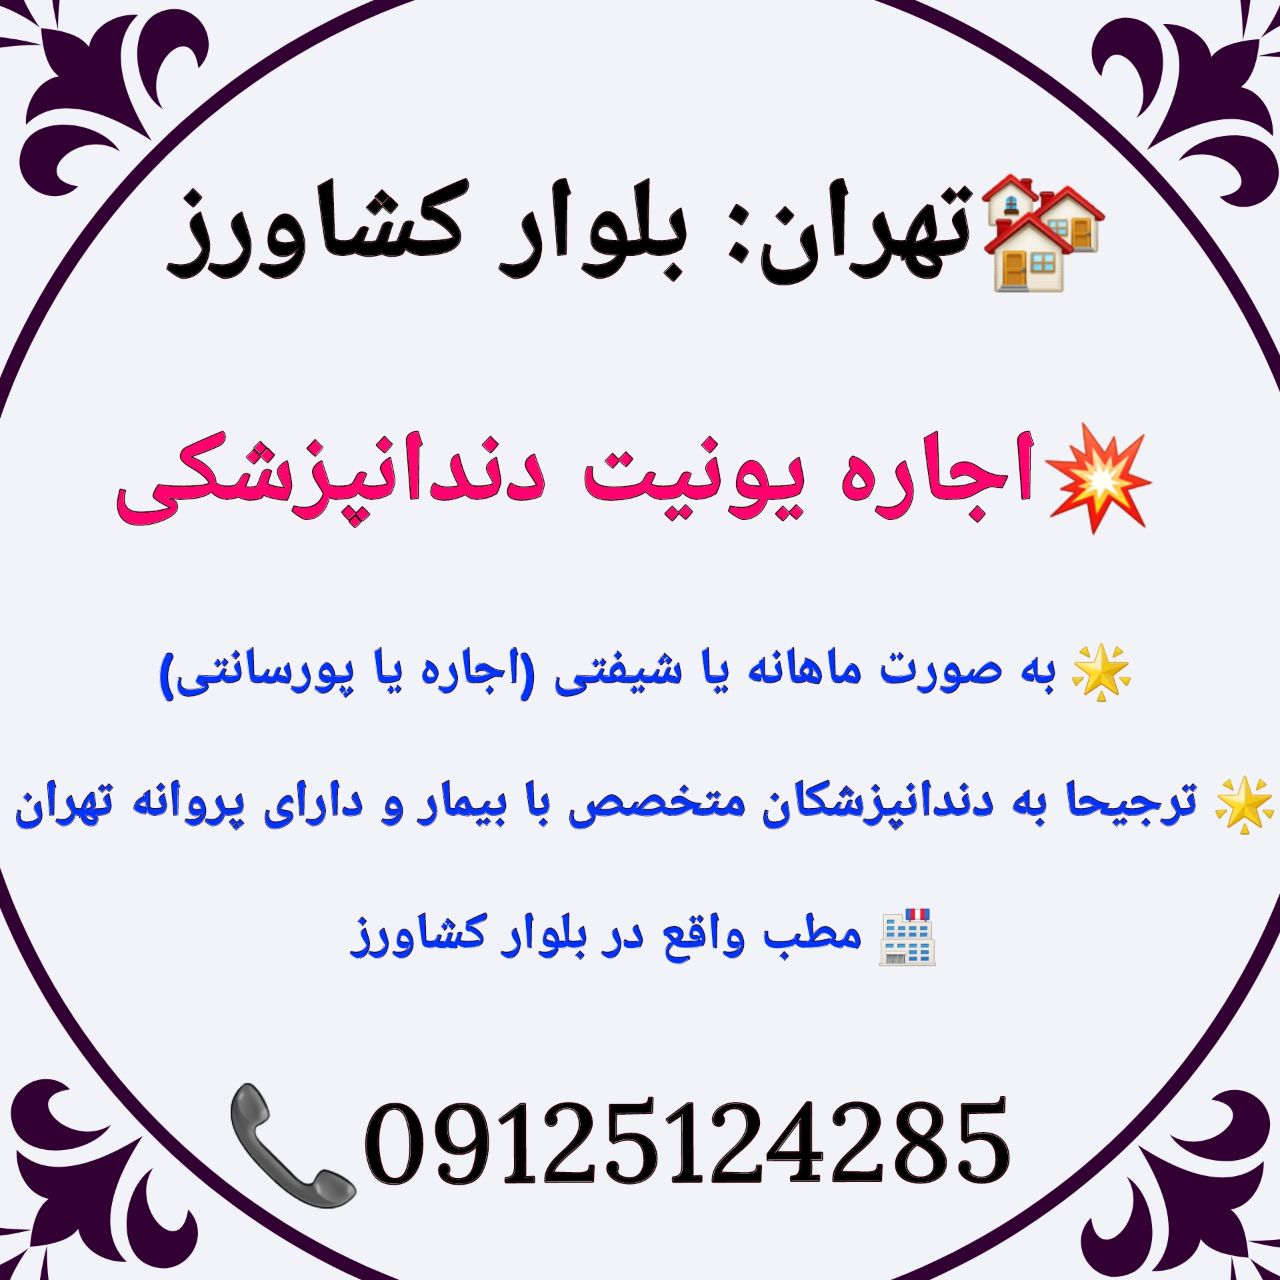 تهران: بلوار کشاورز، اجاره یونیت دندانپزشکی